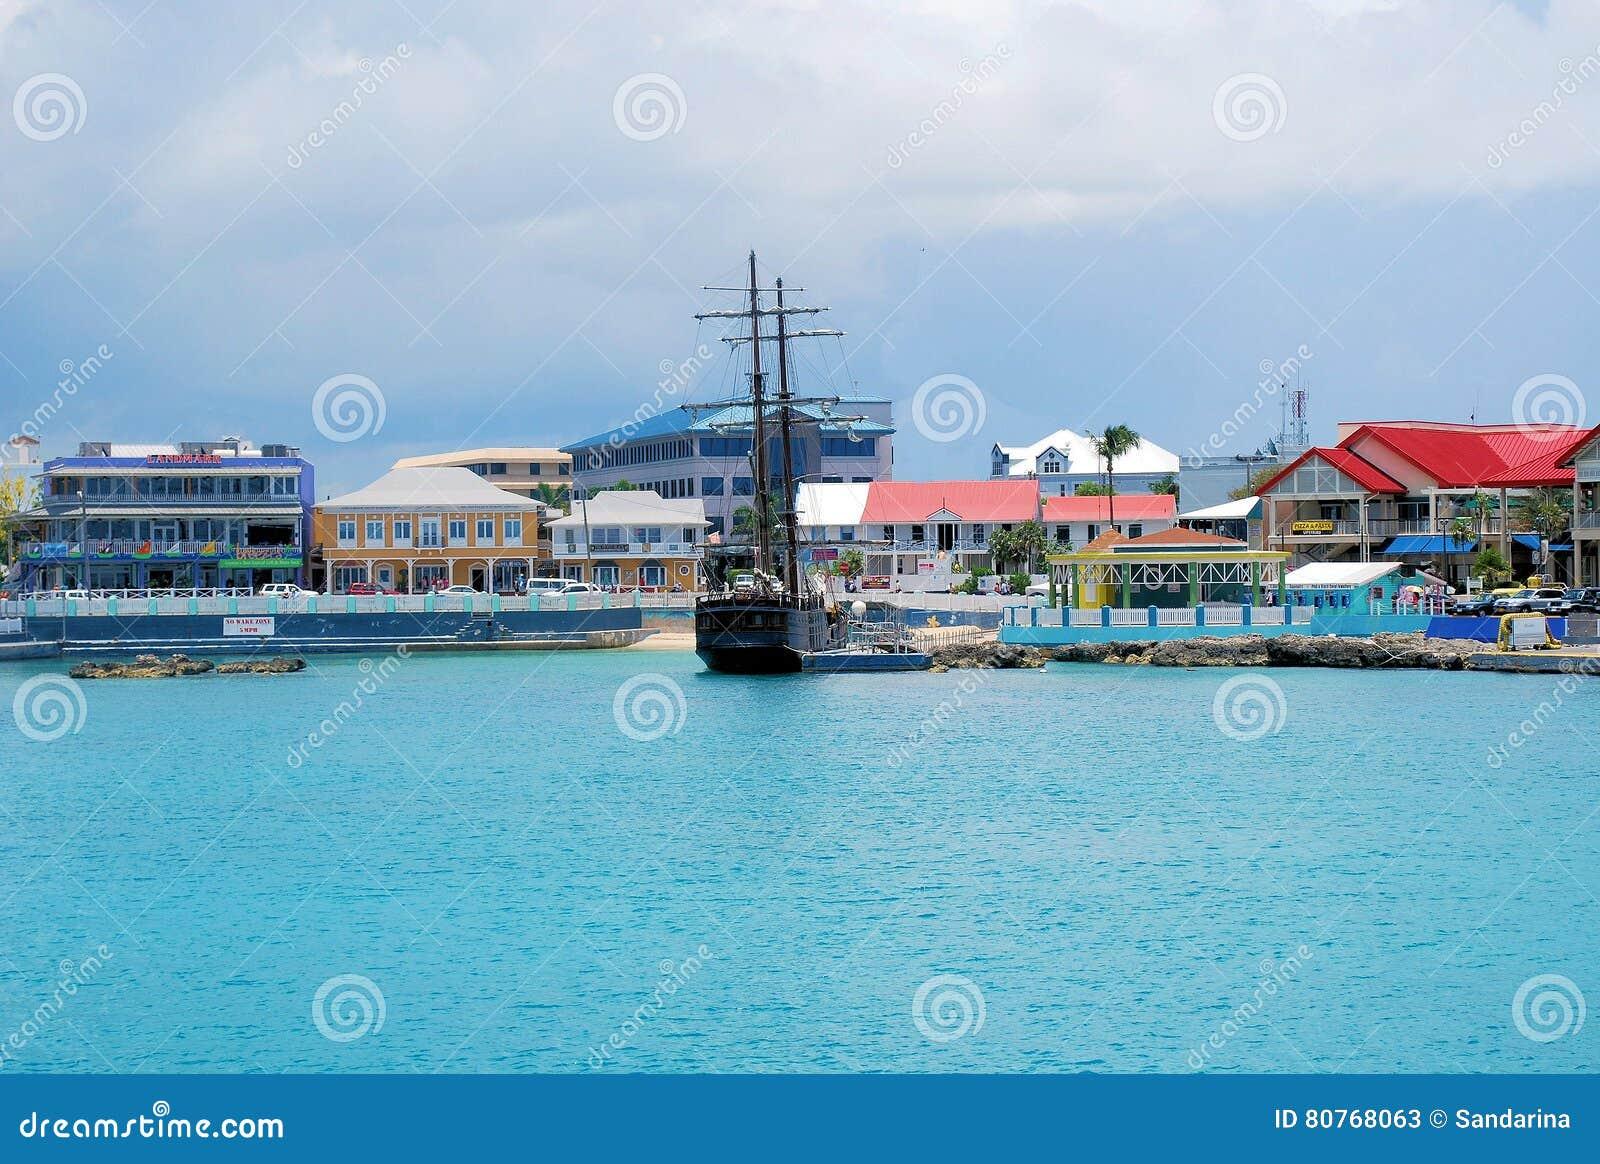 Piraatschip George Town